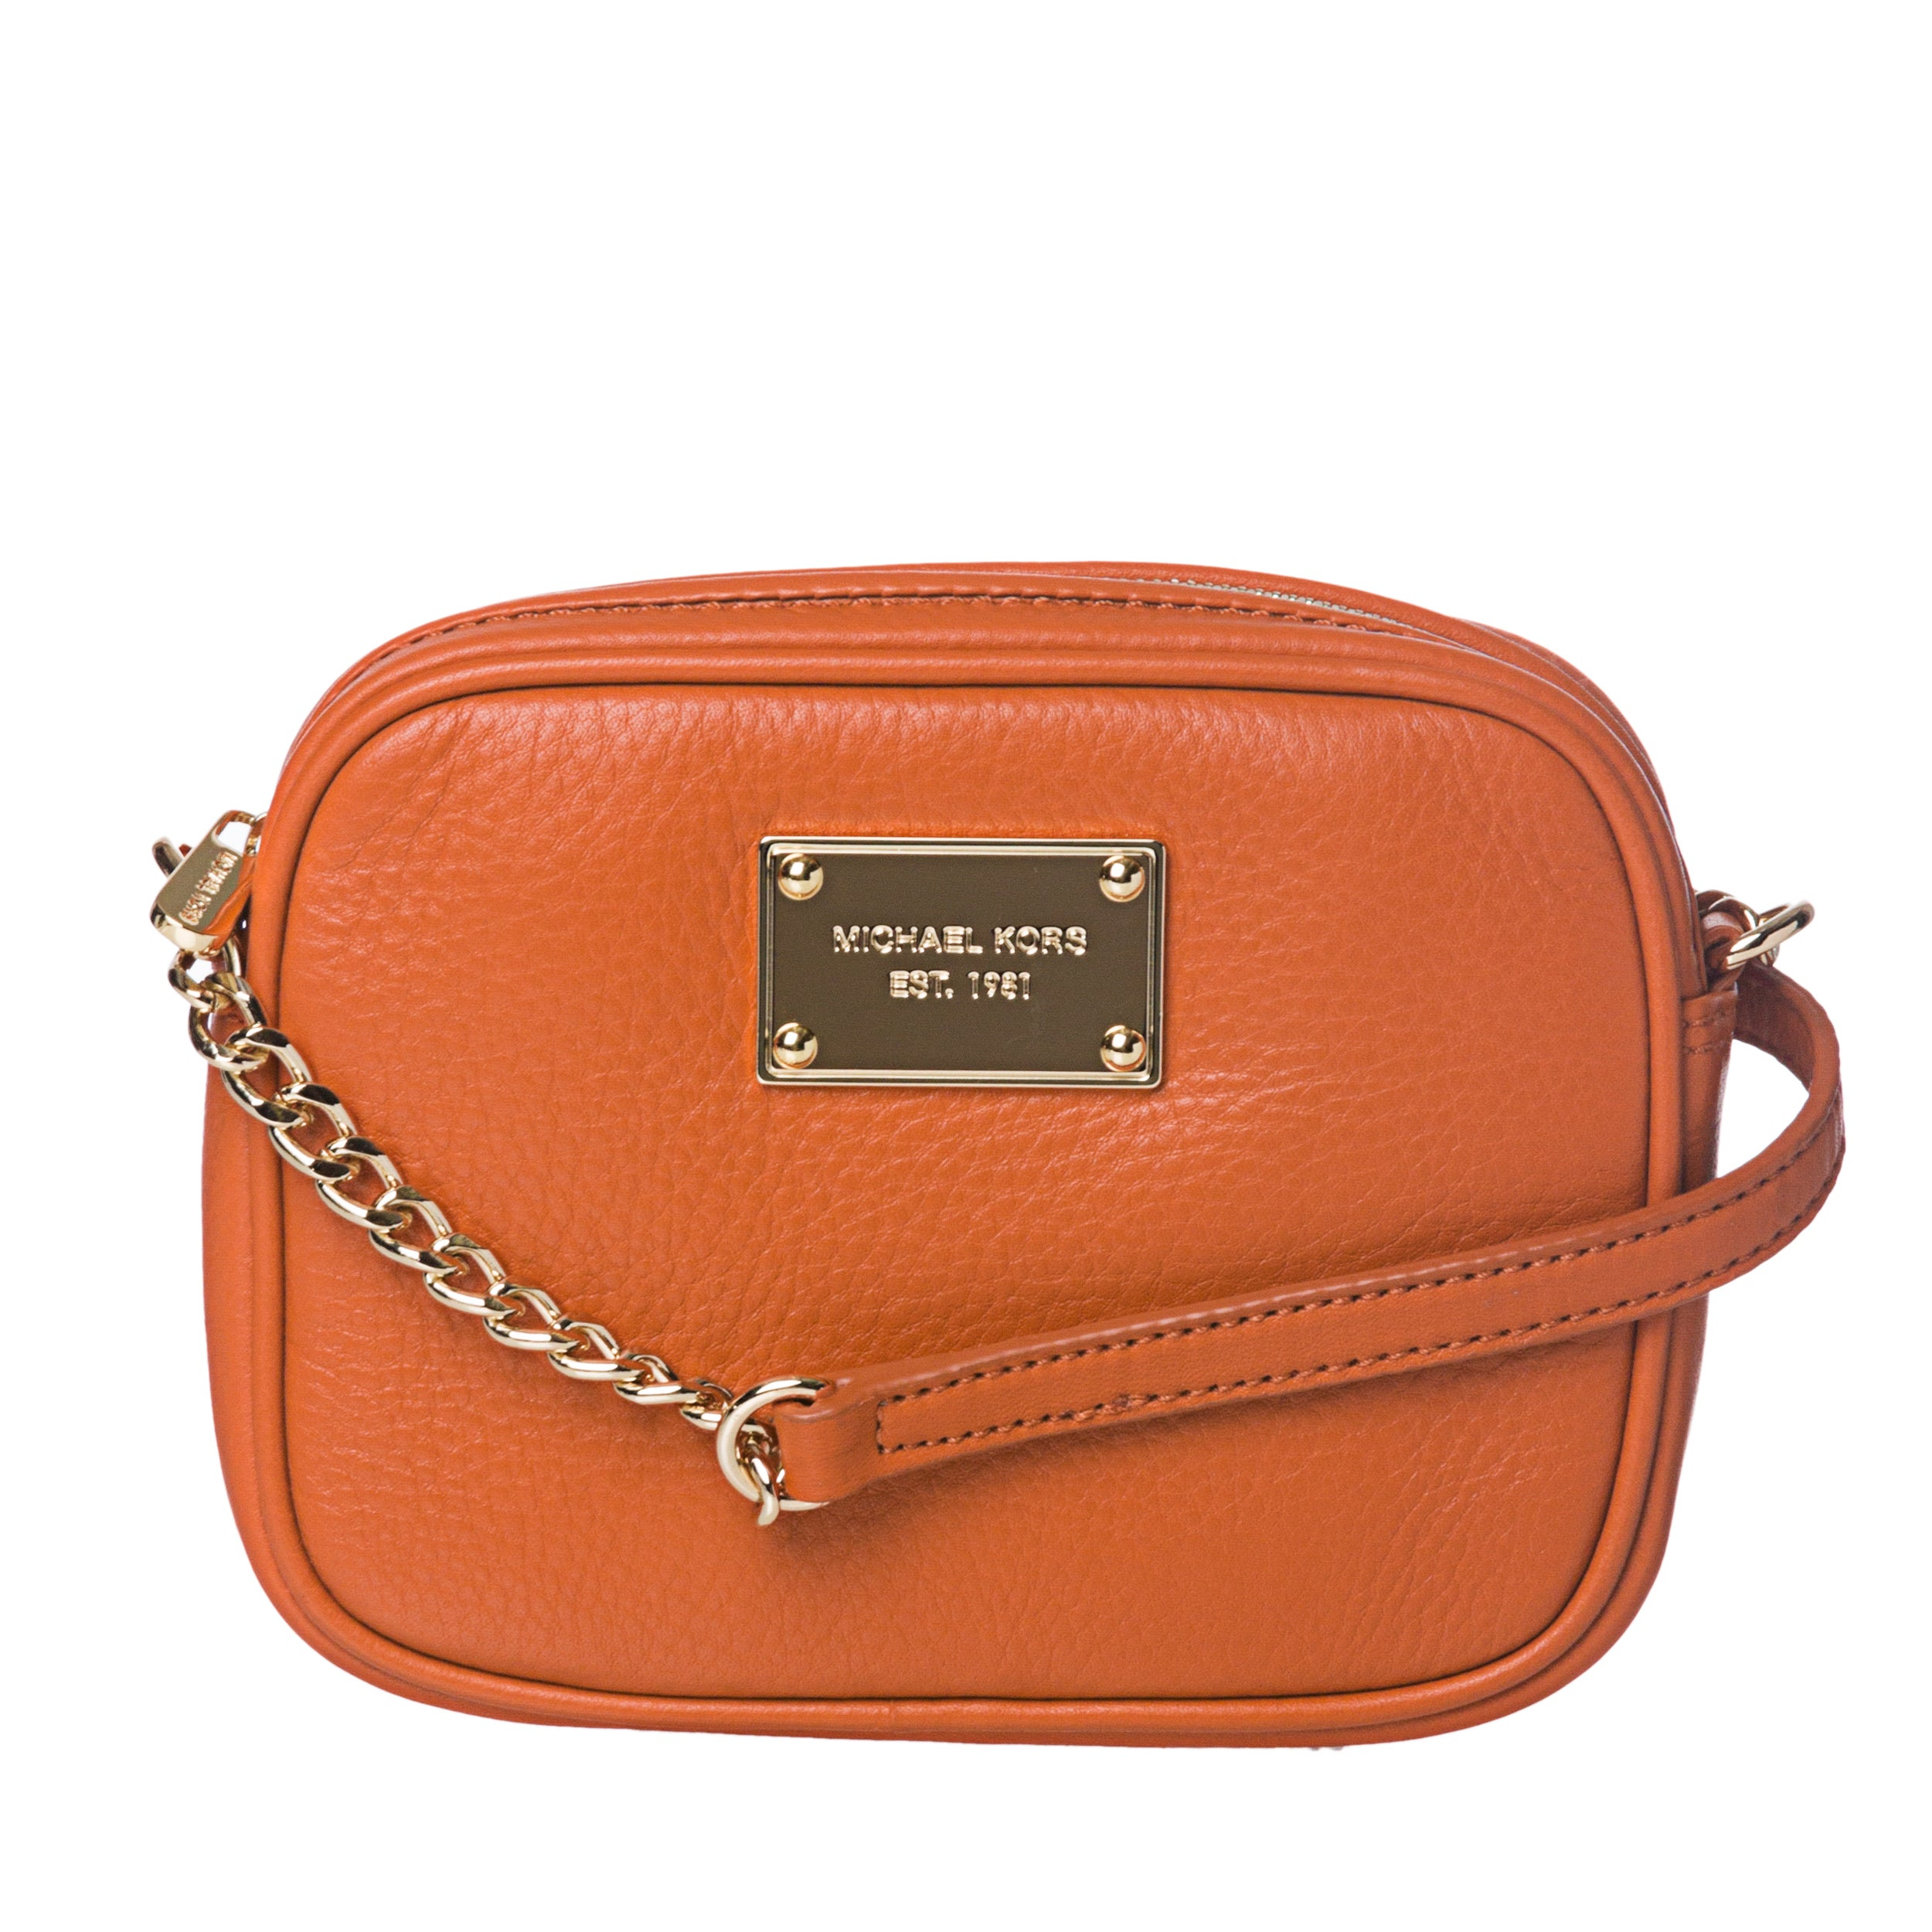 ab11e5911421 Shop Michael Kors 'Jet Set' Mini Pumpkin Leather Cross-body Bag - Free  Shipping Today - Overstock - 6805536